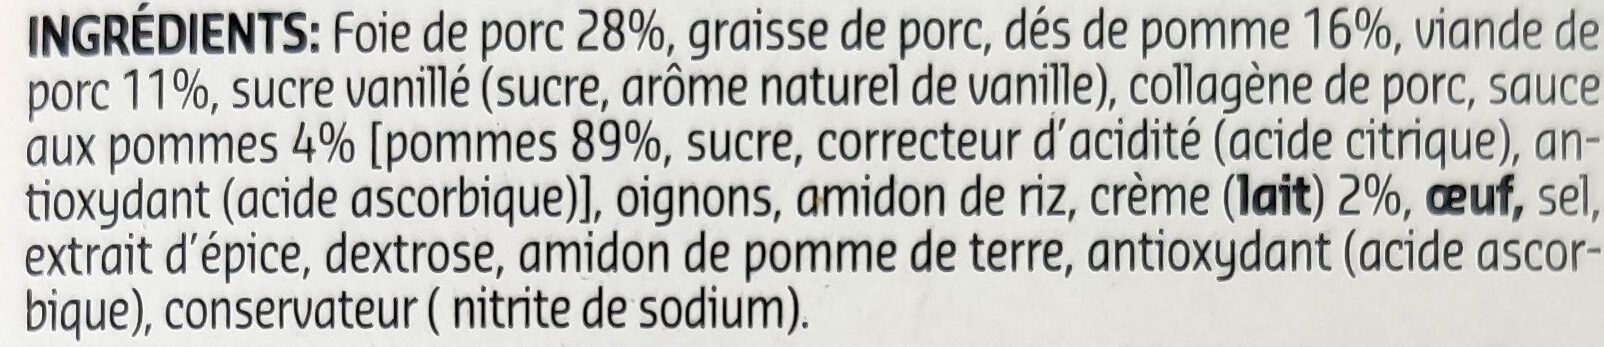 Pâté crème aux pommes - Ingrediënten - fr